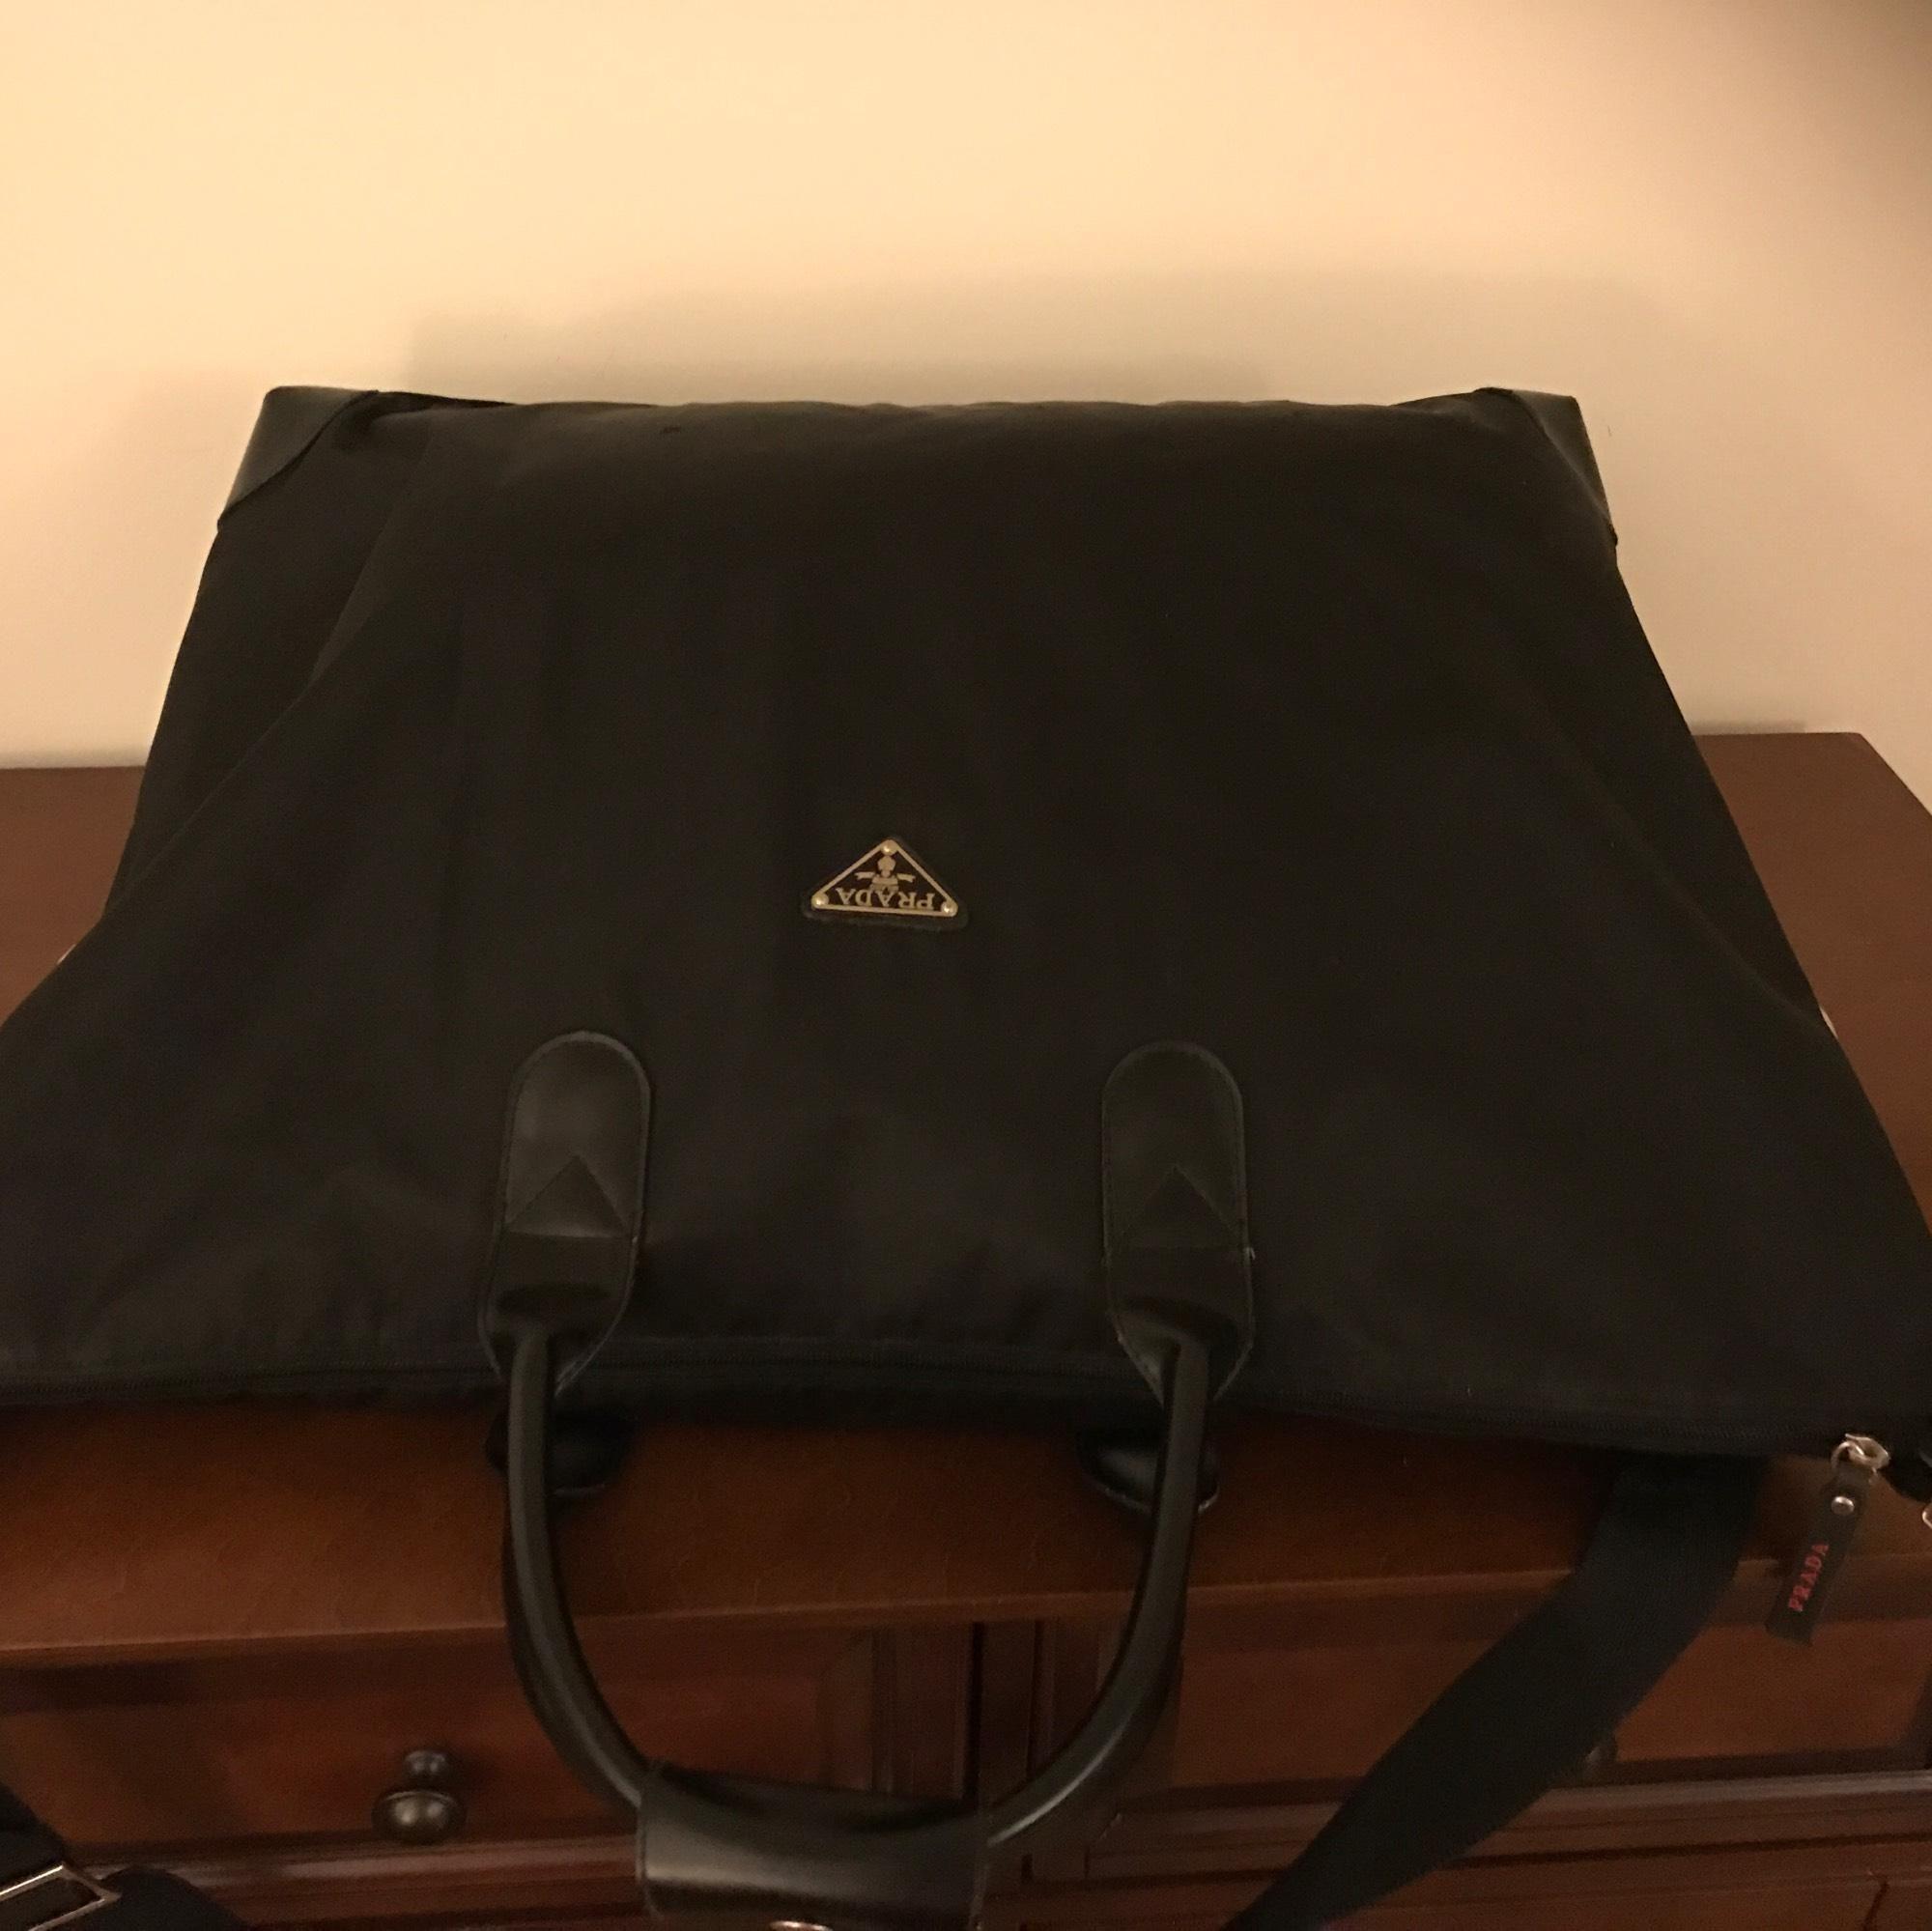 Prada Black Weekend Travel Bag 72% off retail c5379065409b0